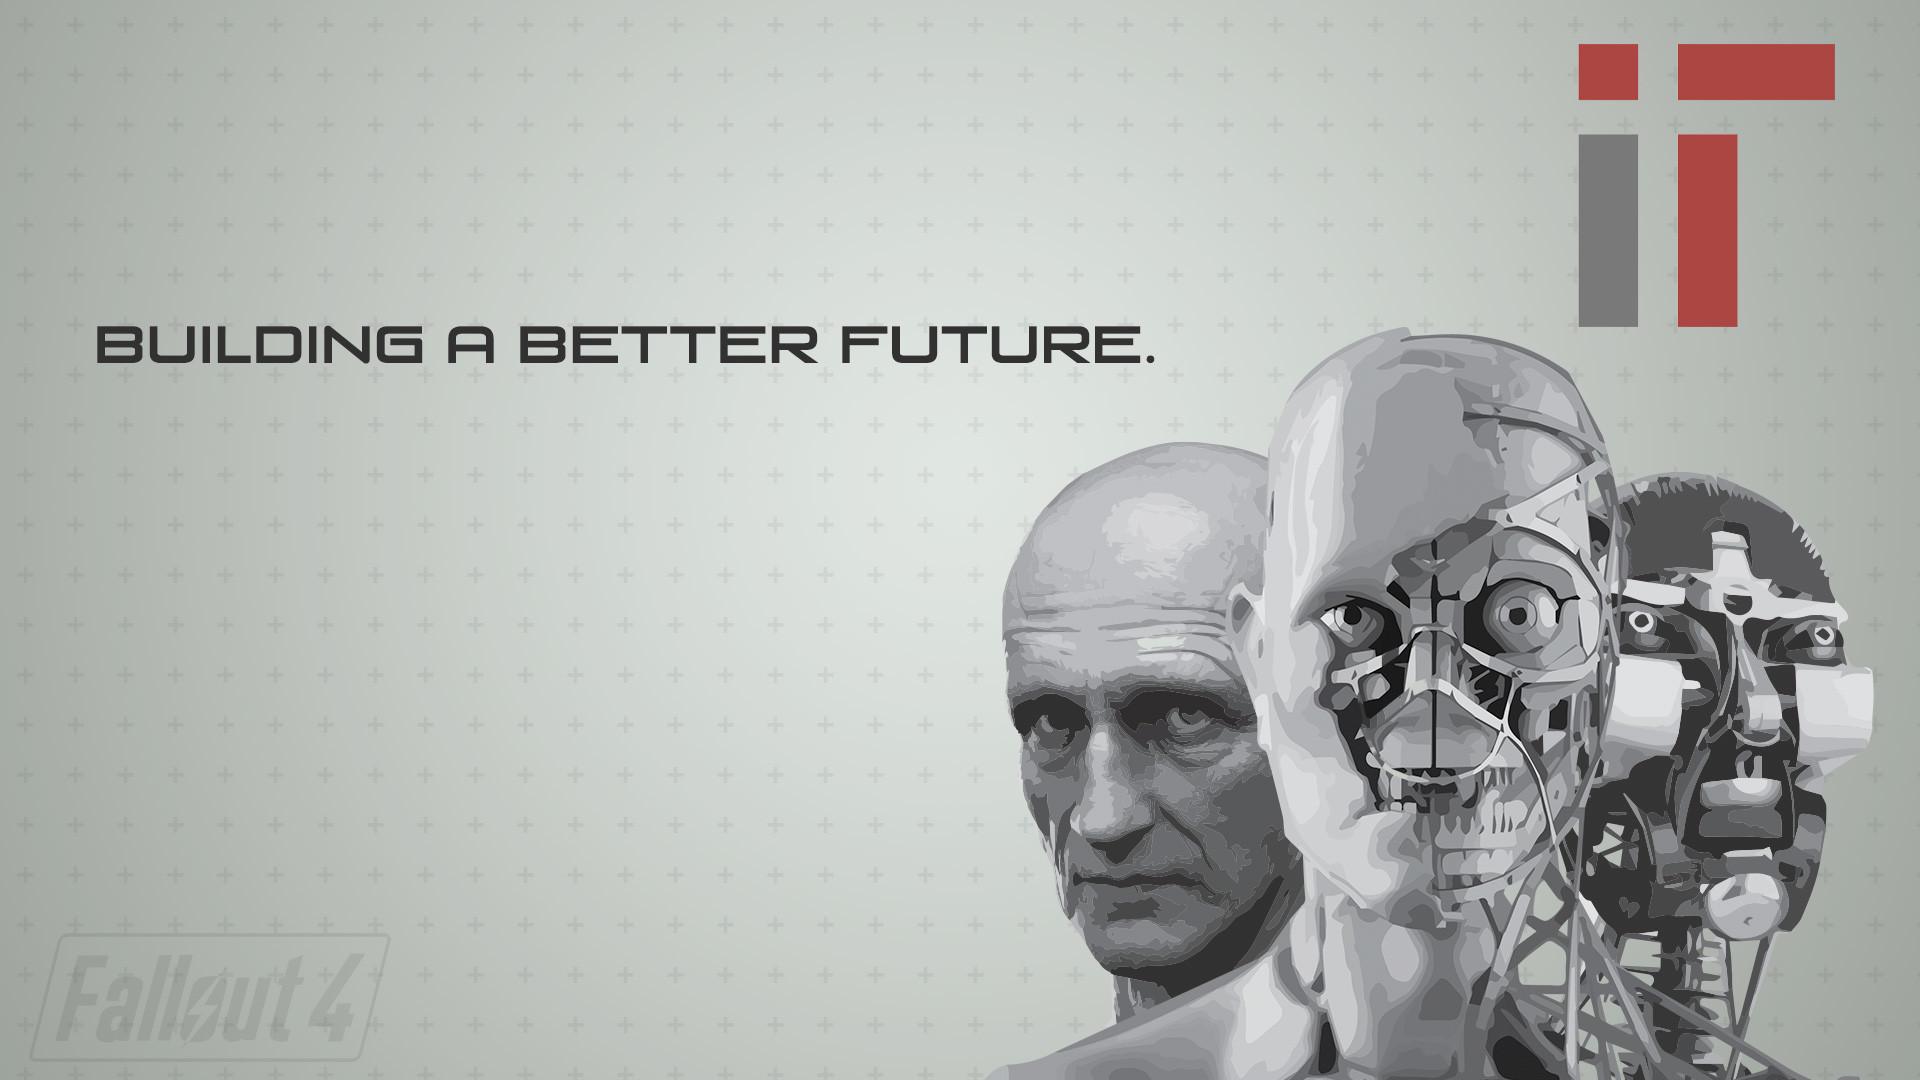 The Institute Fallout 4 Mobile Wallpaper. Click to View Fullscreen. Click  to View Fullscreen